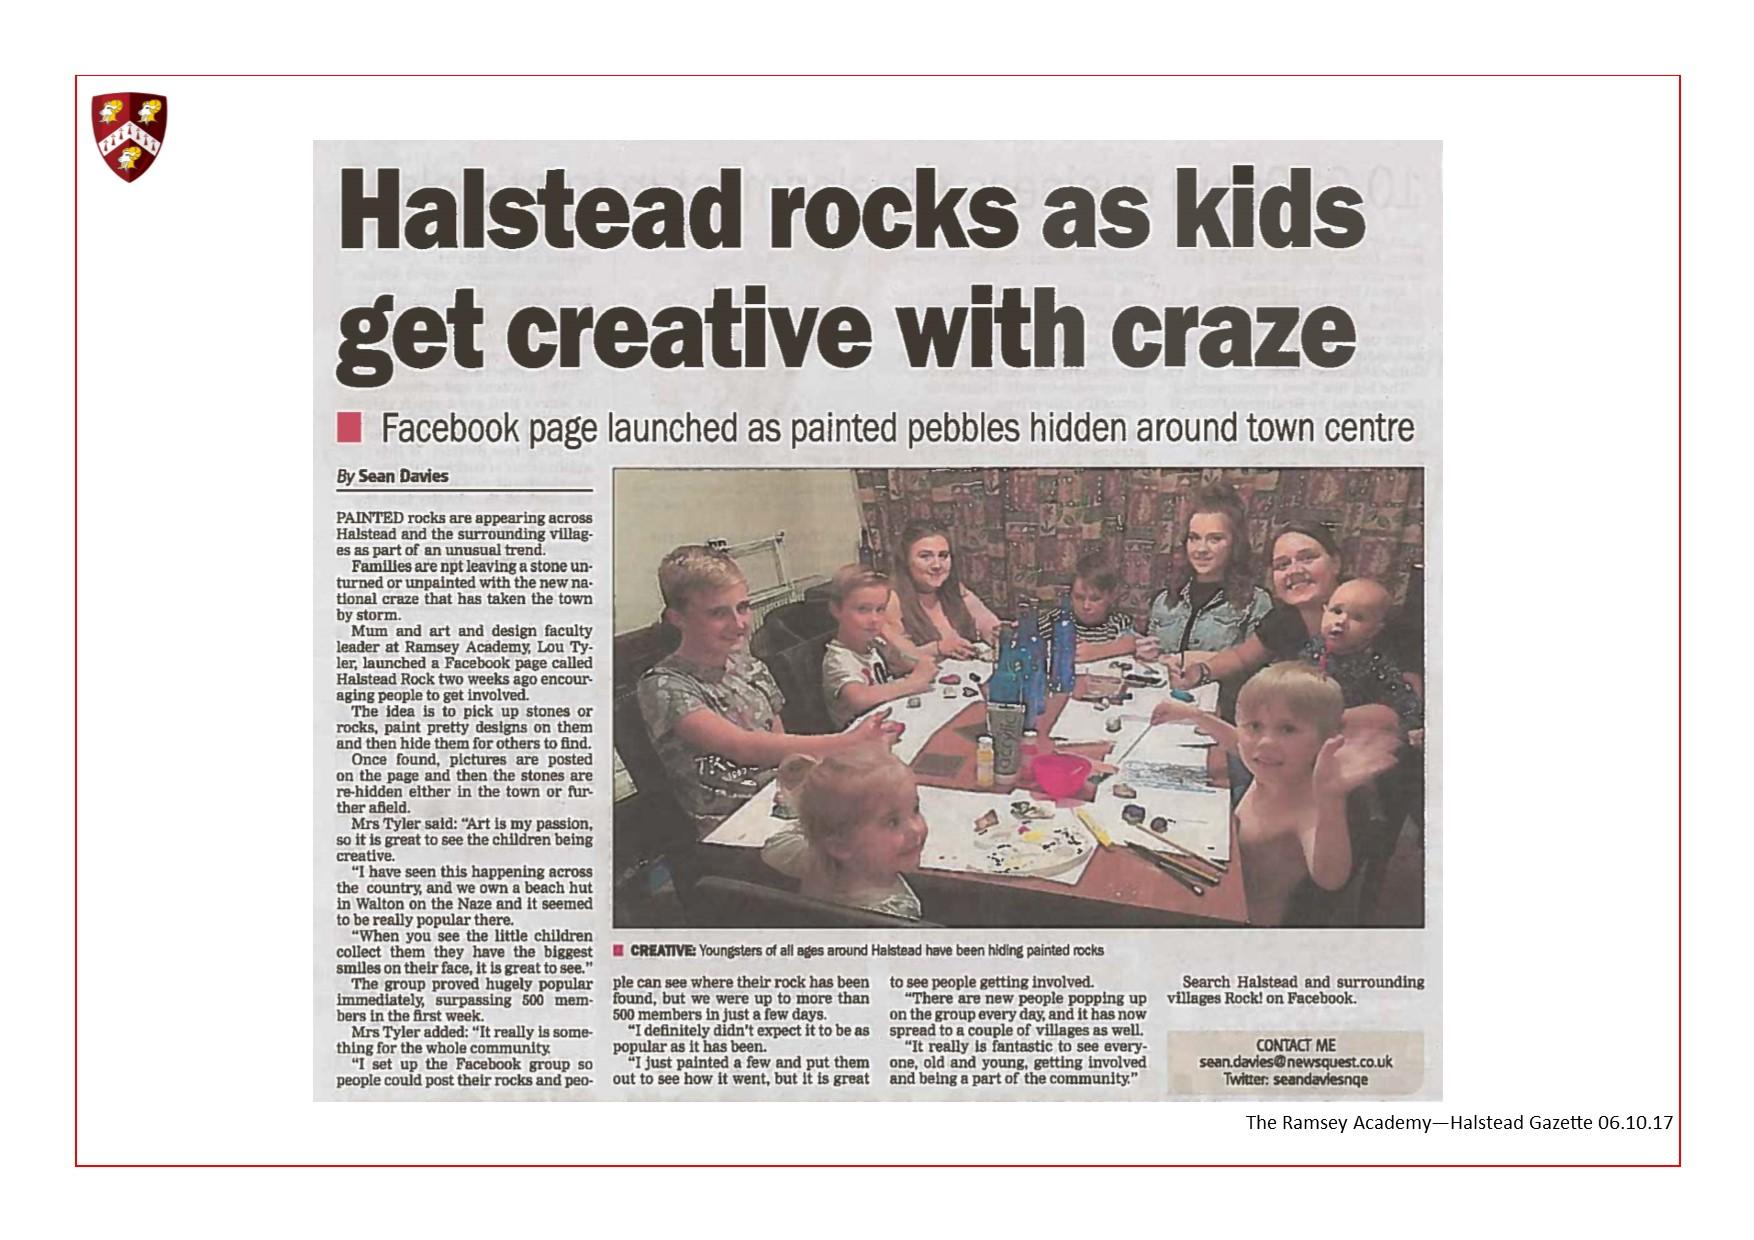 Halstead Rocks As Kids Get Creative With Craze 06.10.17